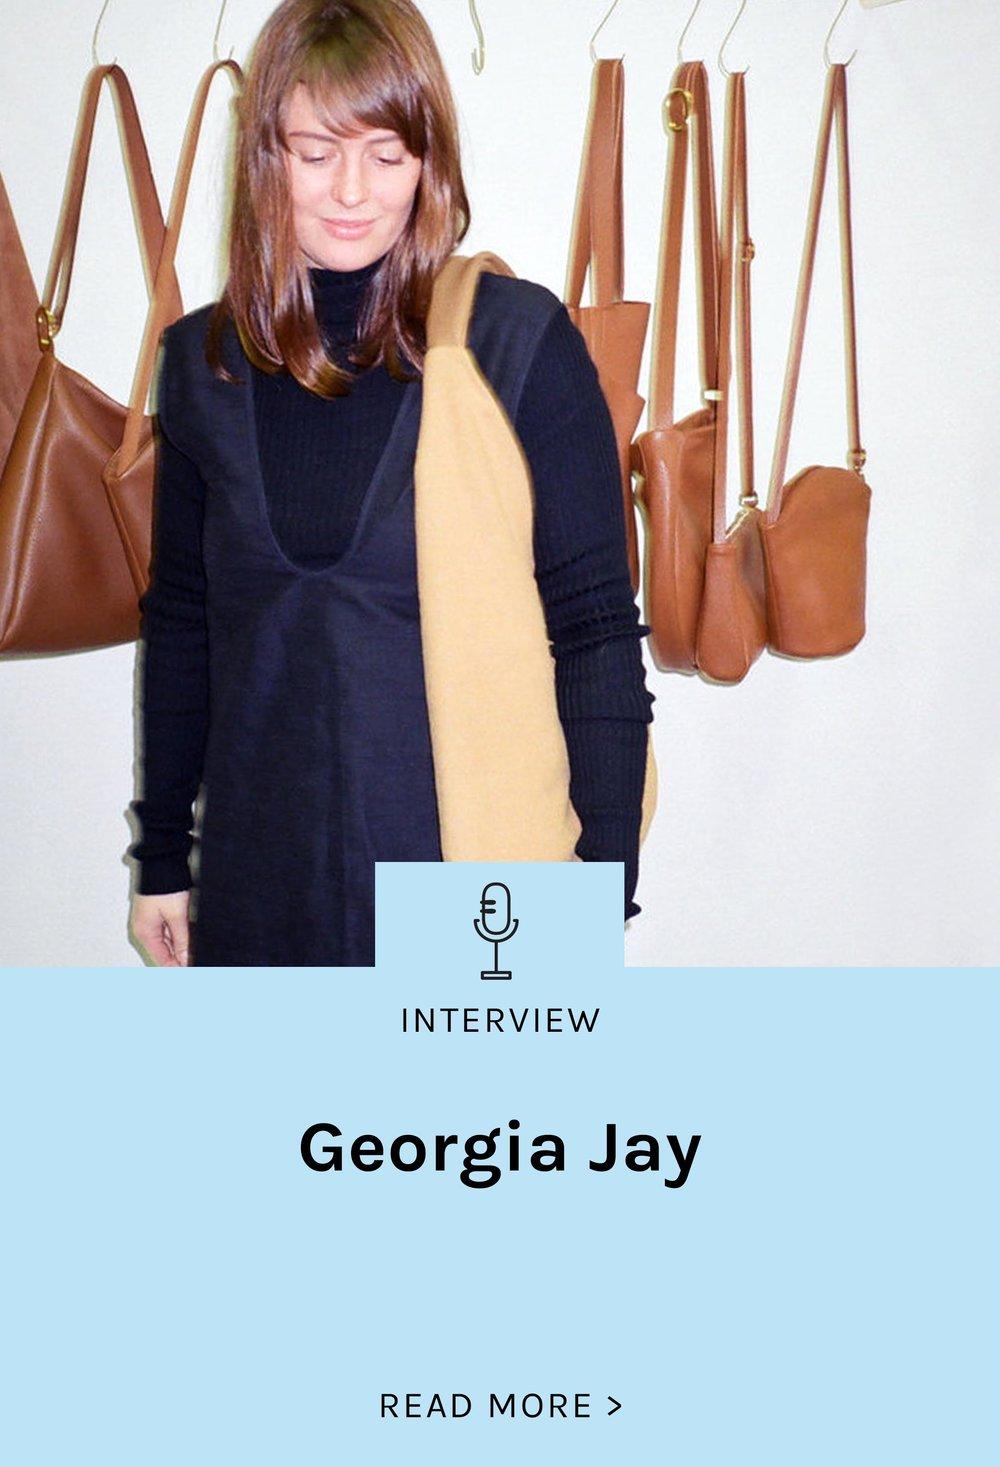 Georgia-Jay-Interview-BlogLanding.jpg